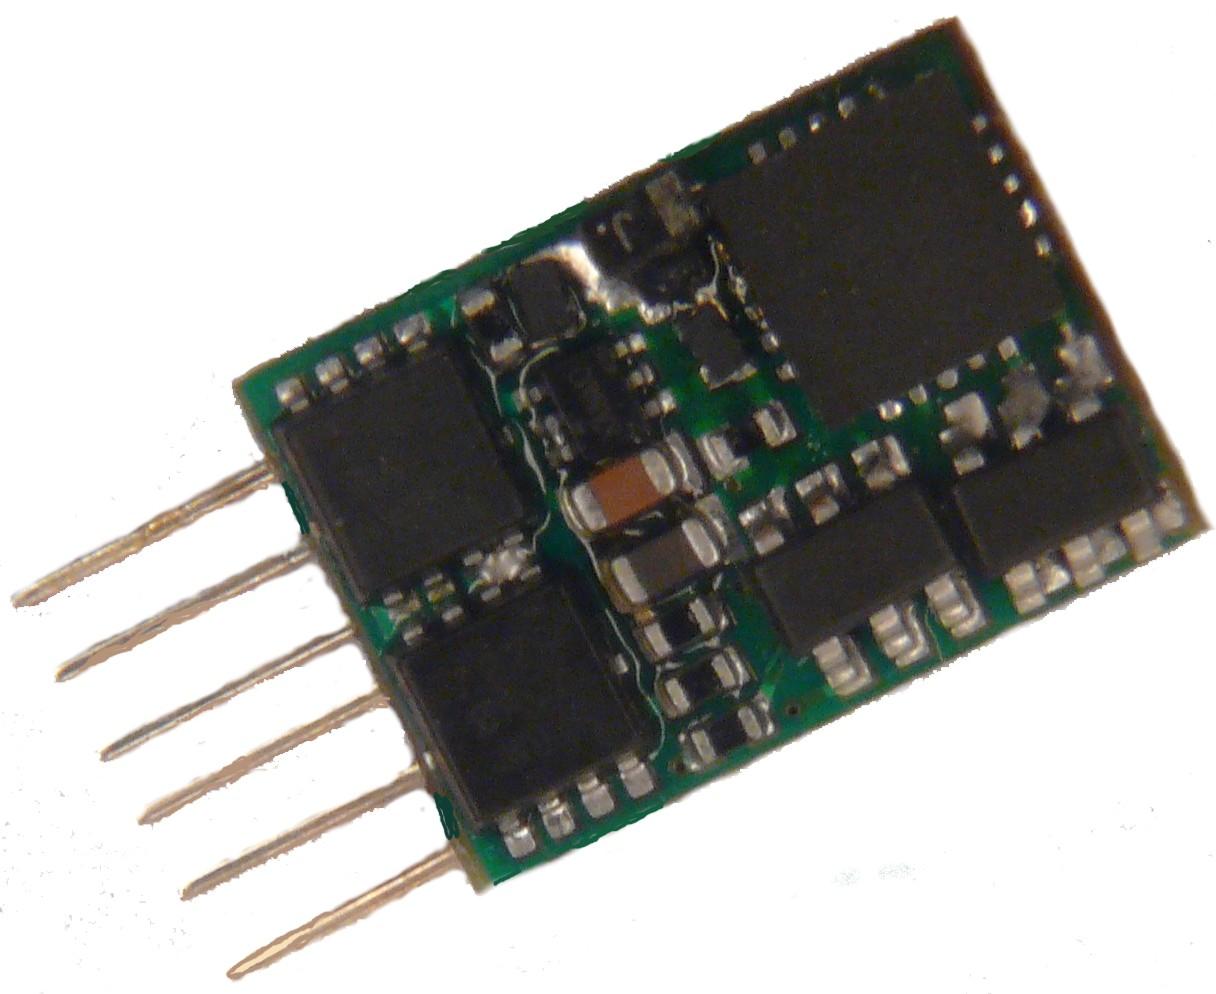 ZIMO MX622N Decoder 0,8A NEM-651 NMRA DCC MM Motorola 6 pol Spur N